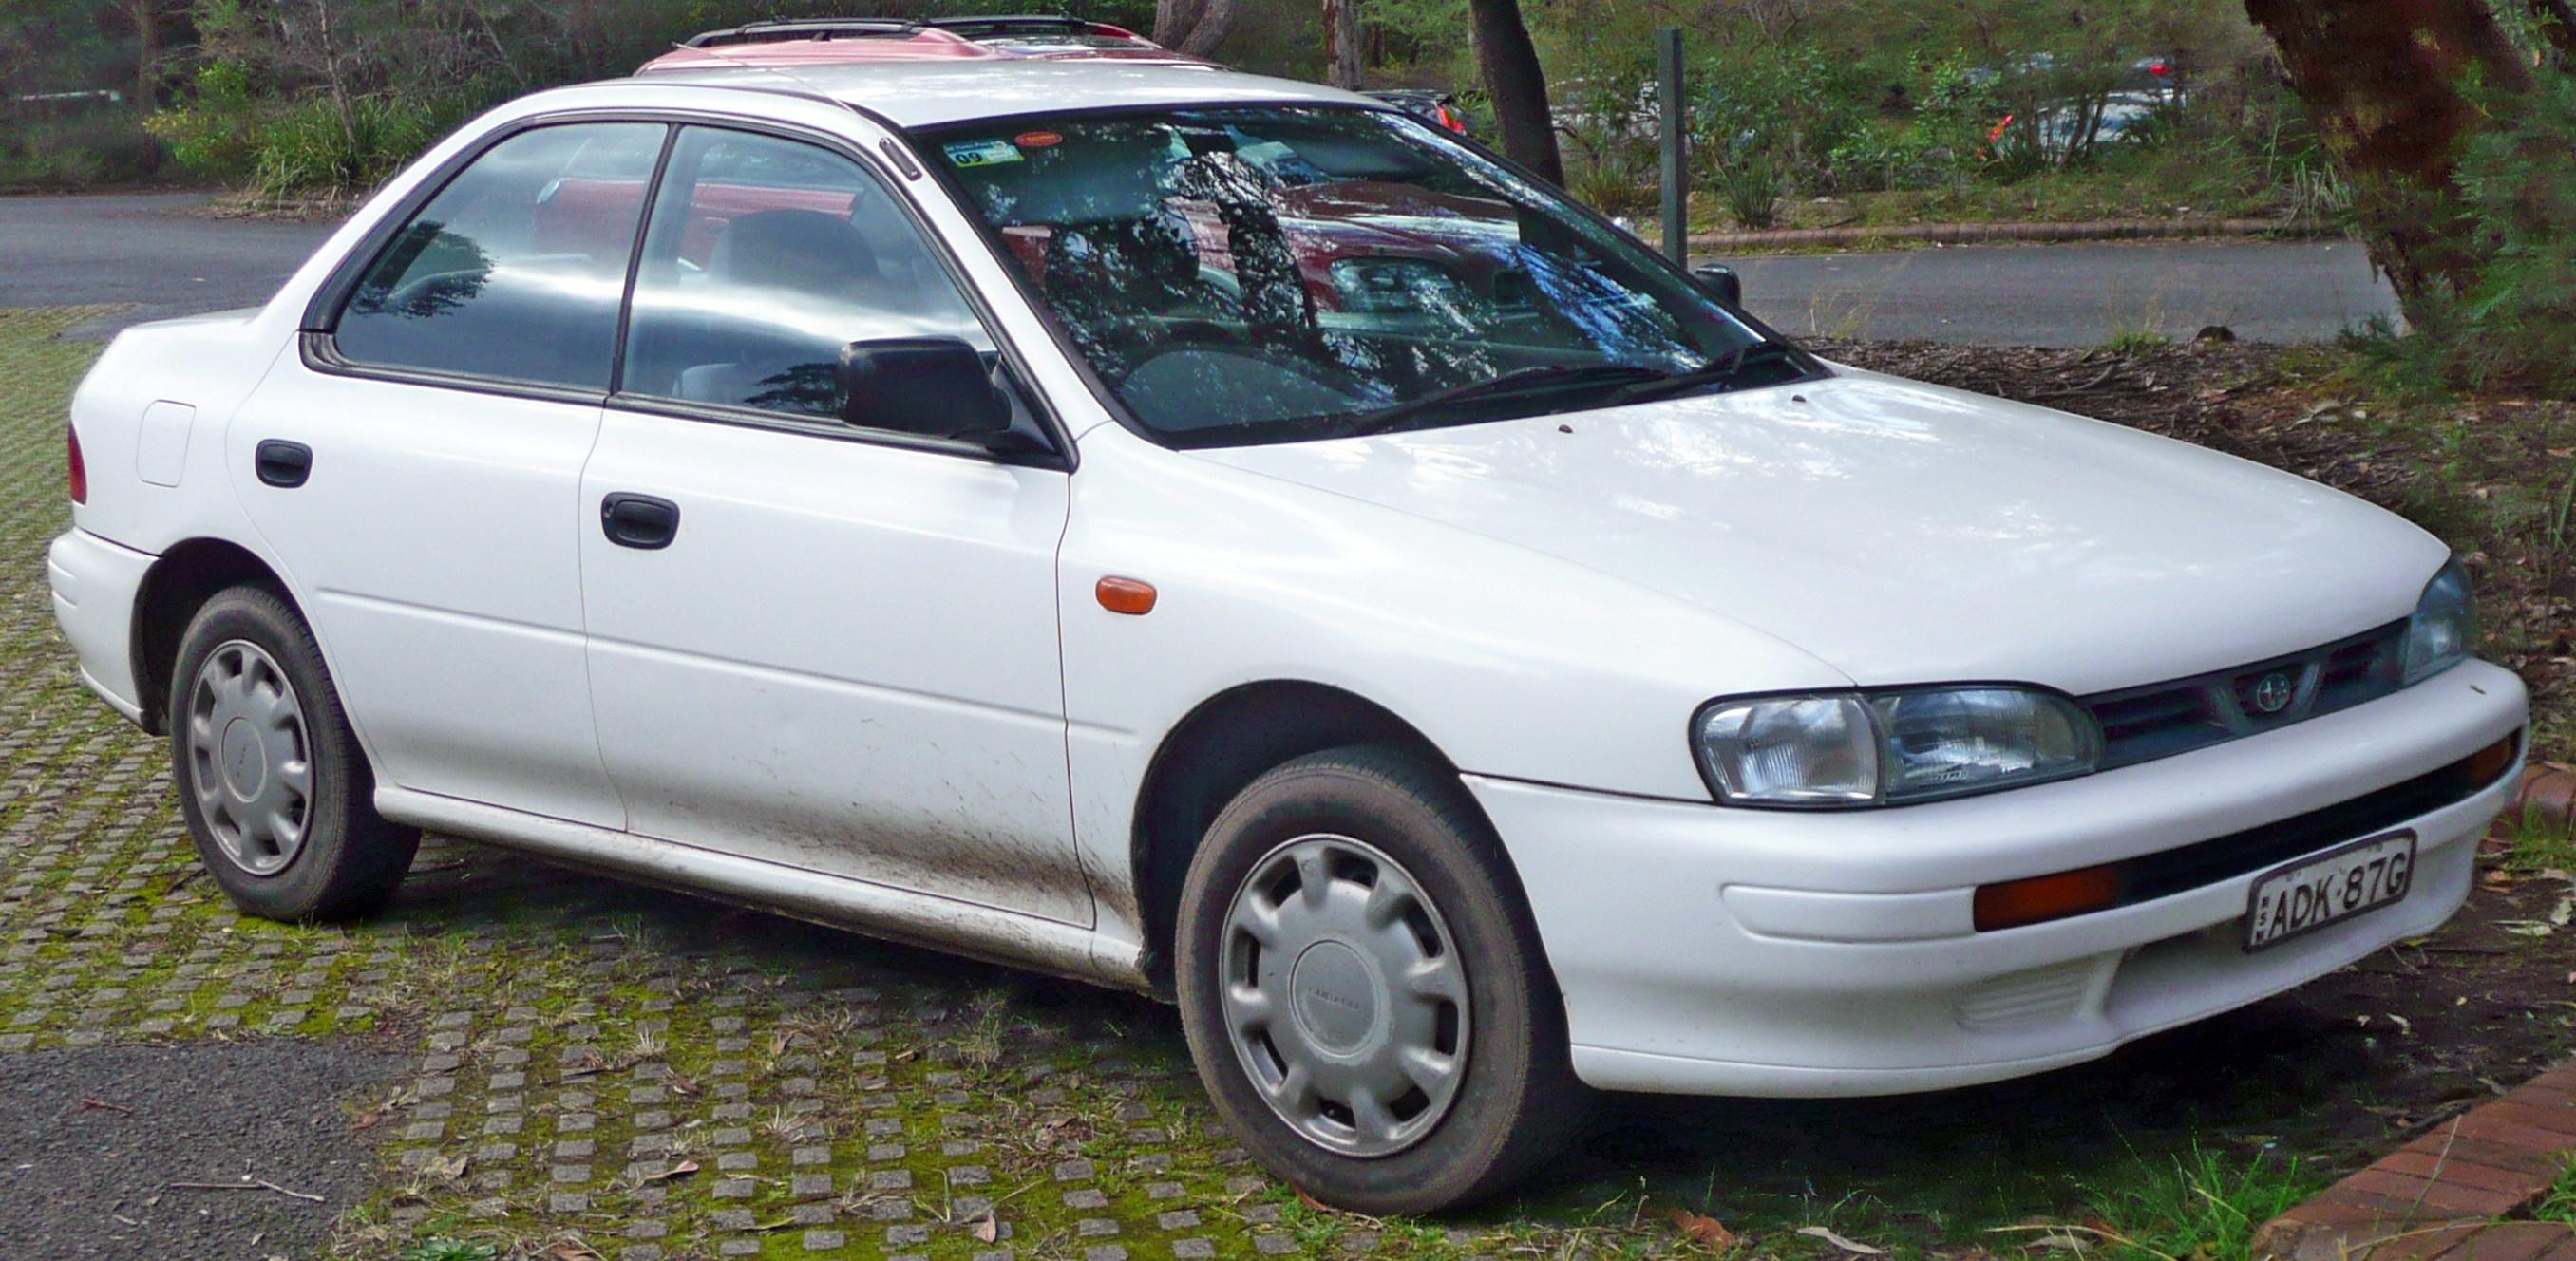 1995 Subaru Impreza Image 2